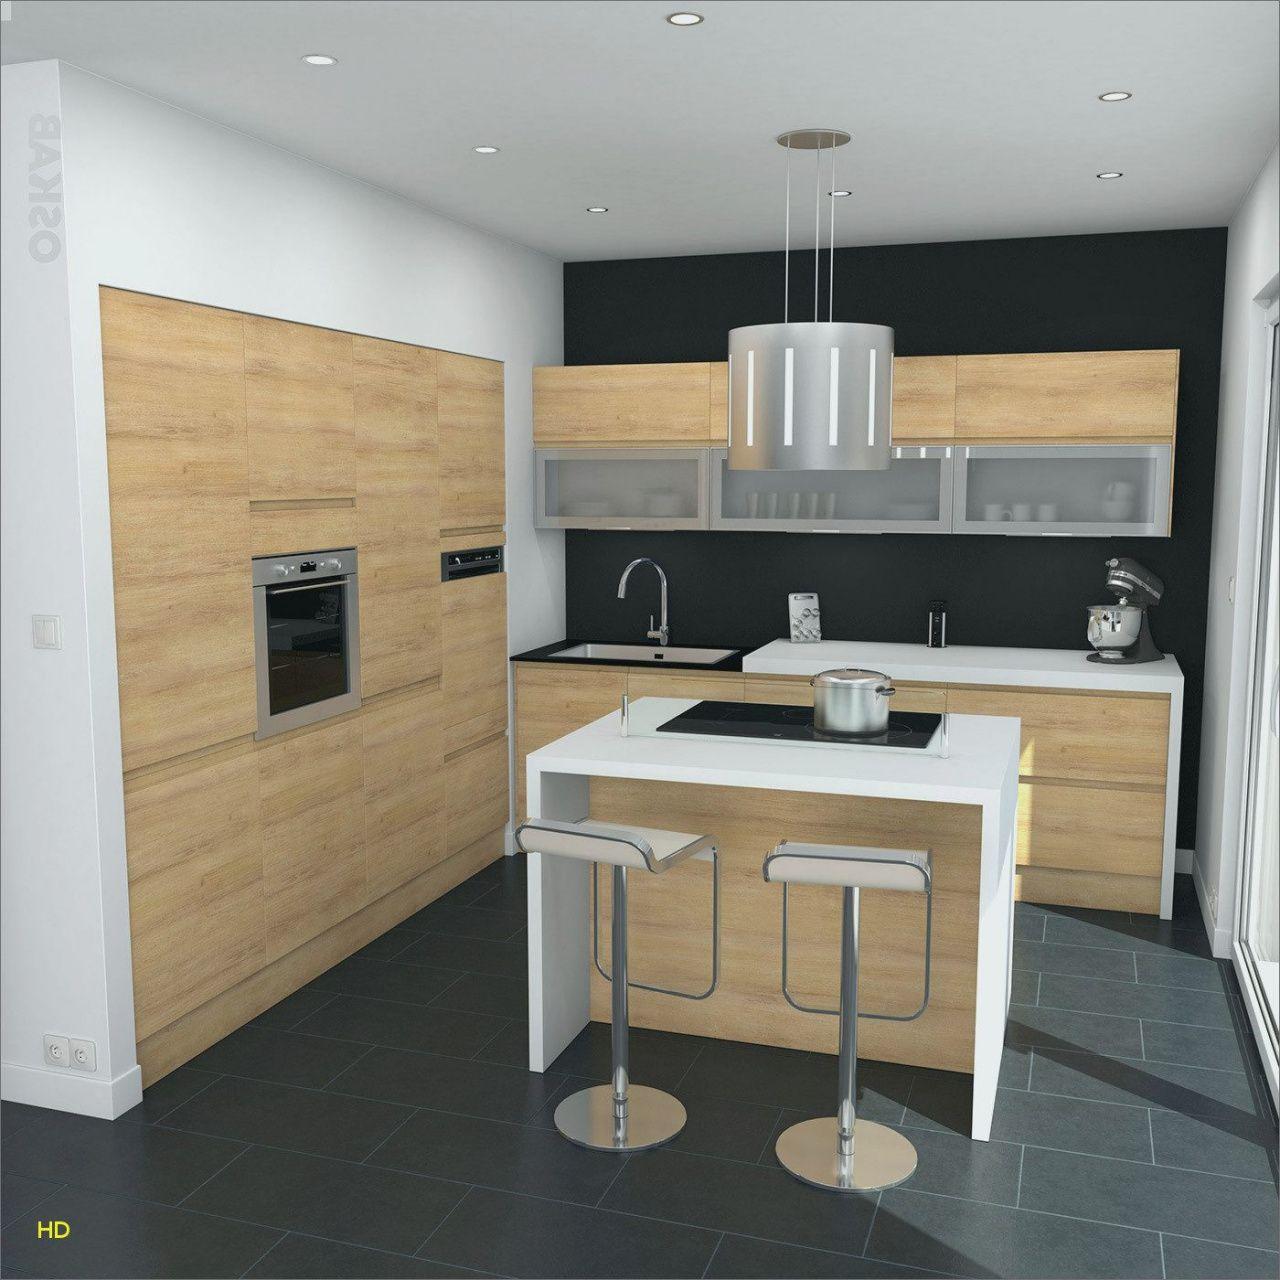 50 Meuble Cuisine Occasion Particulier Check More At Https Southfloridasalon Com 70 Meuble Cuisine Occasio Fresh Kitchen Kitchen Design Home Decor Furniture